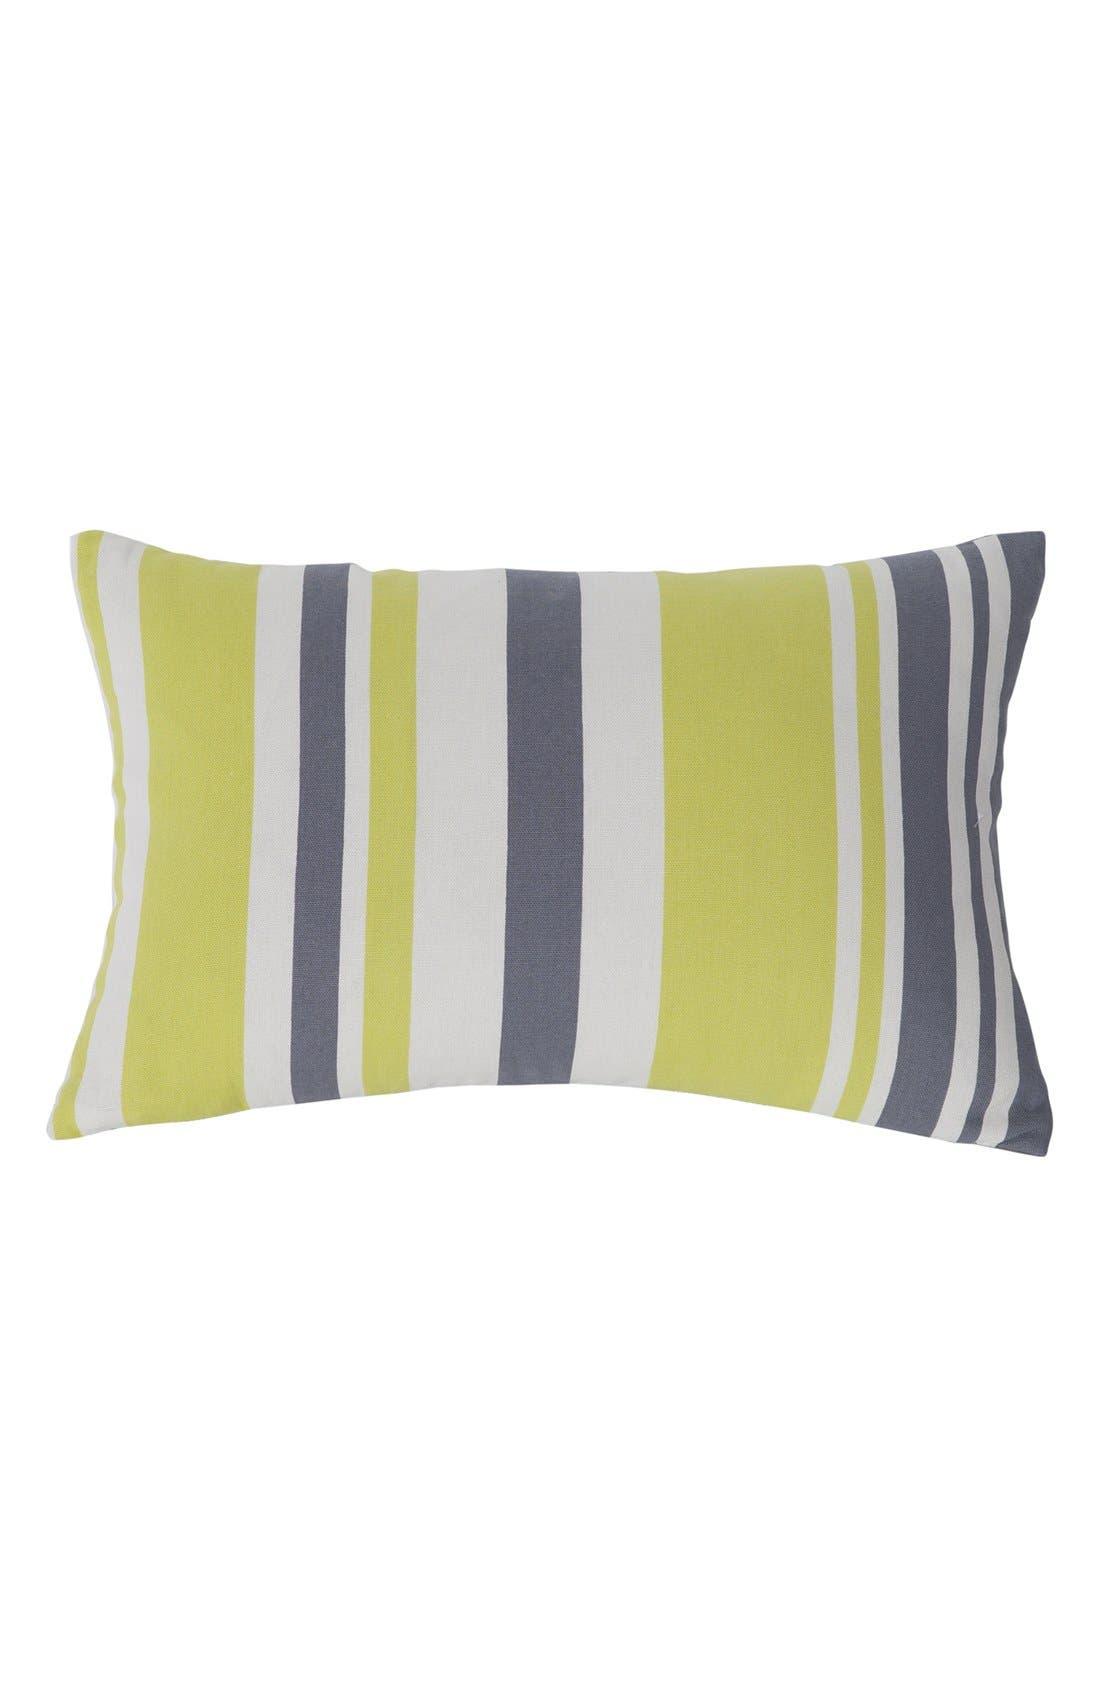 'Etta' Pillow,                         Main,                         color, 100